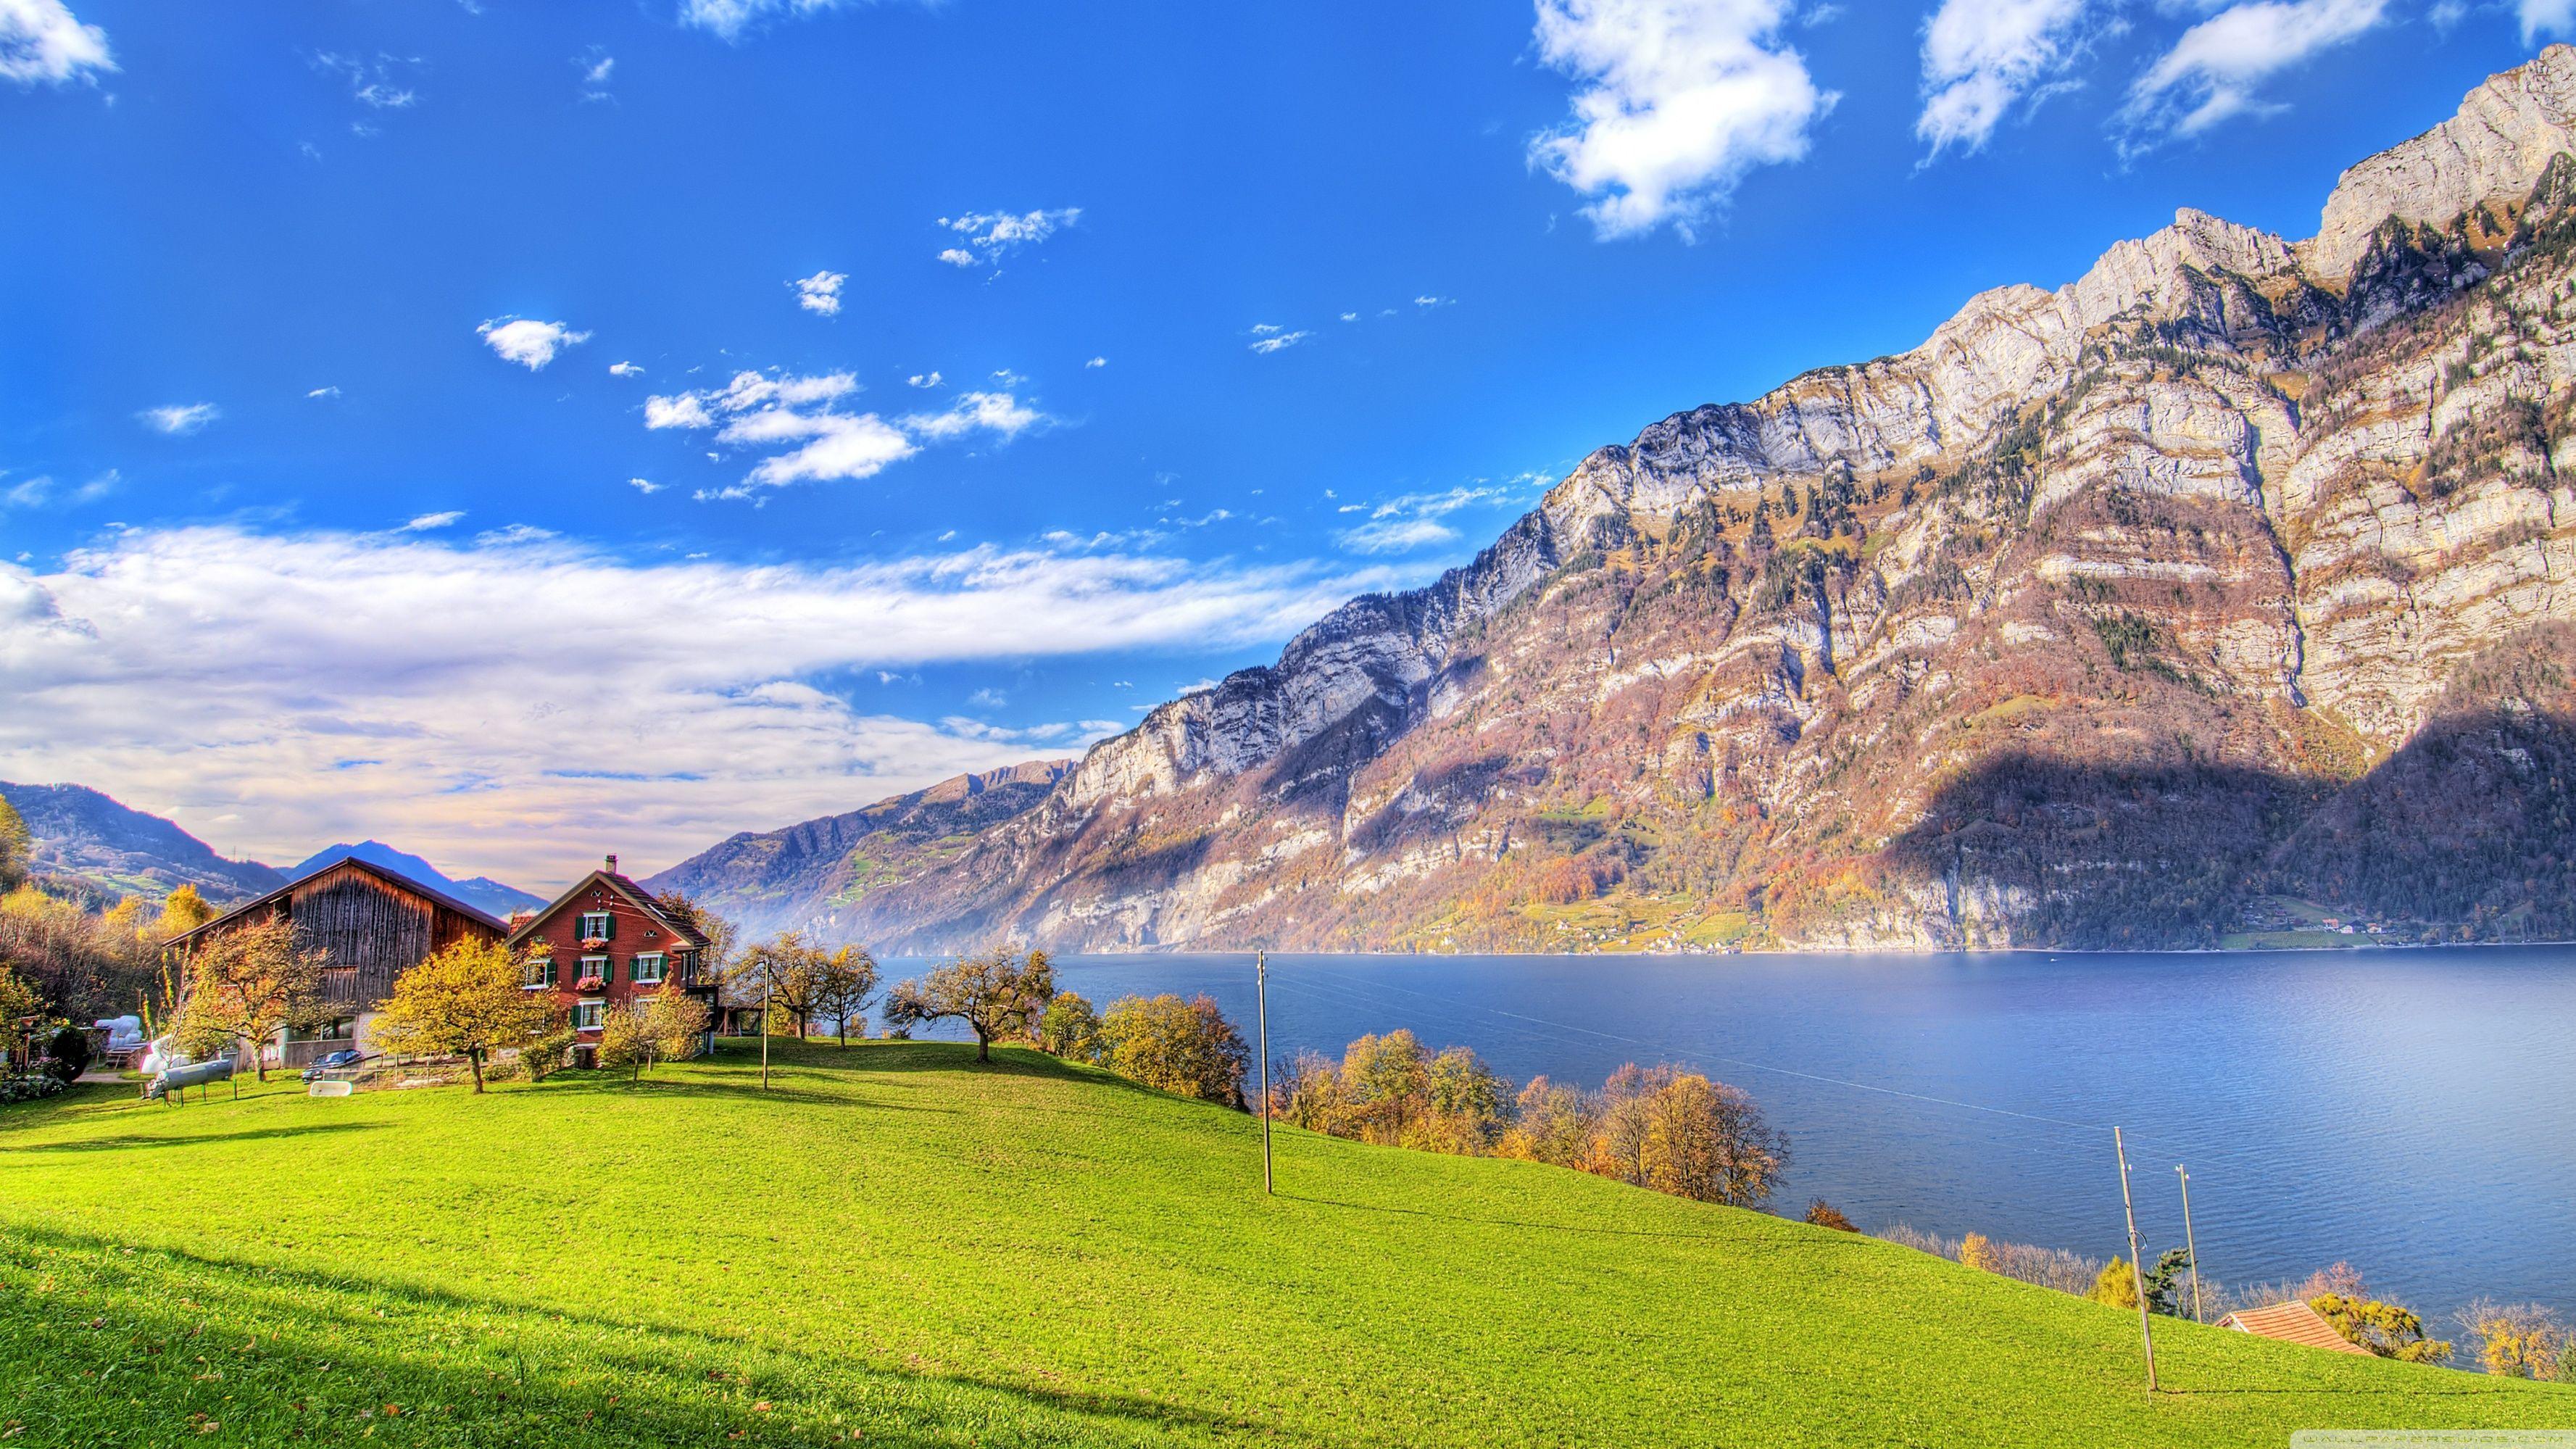 Swiss Landscape Wallpapers Best Desktop With Wallpaper High Resolution For  Laptop